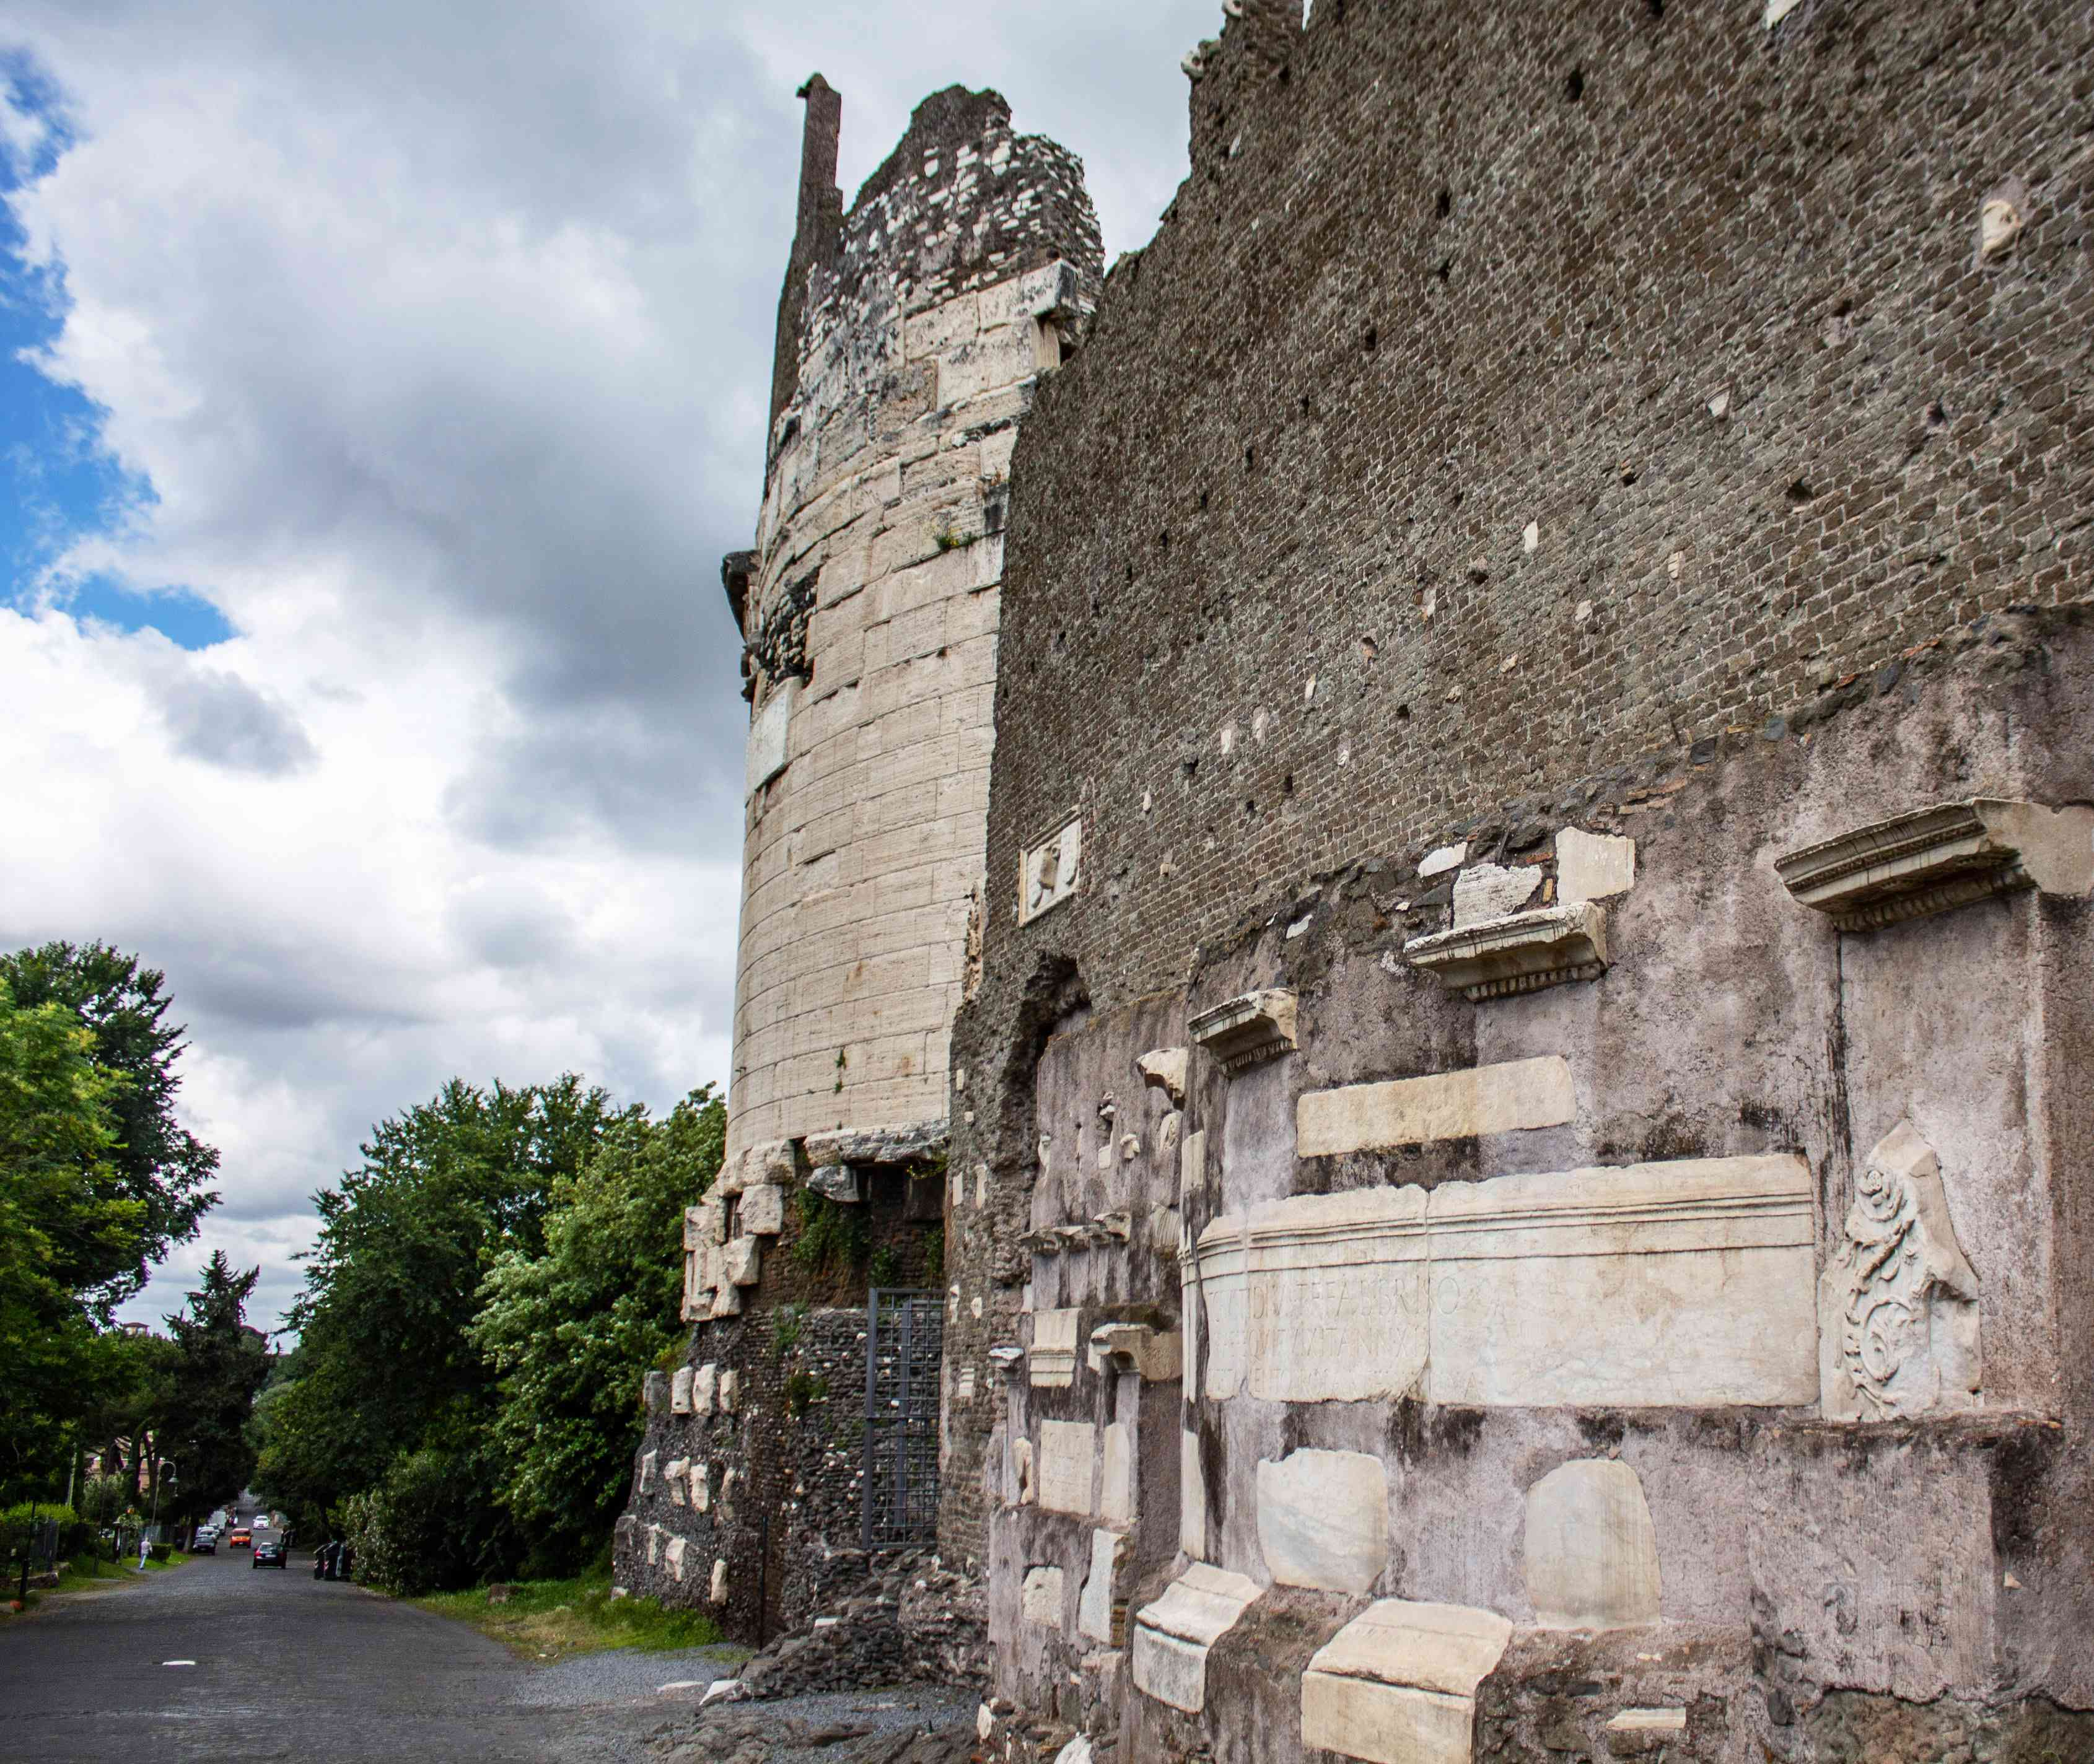 Roman ruins along the Appian Way